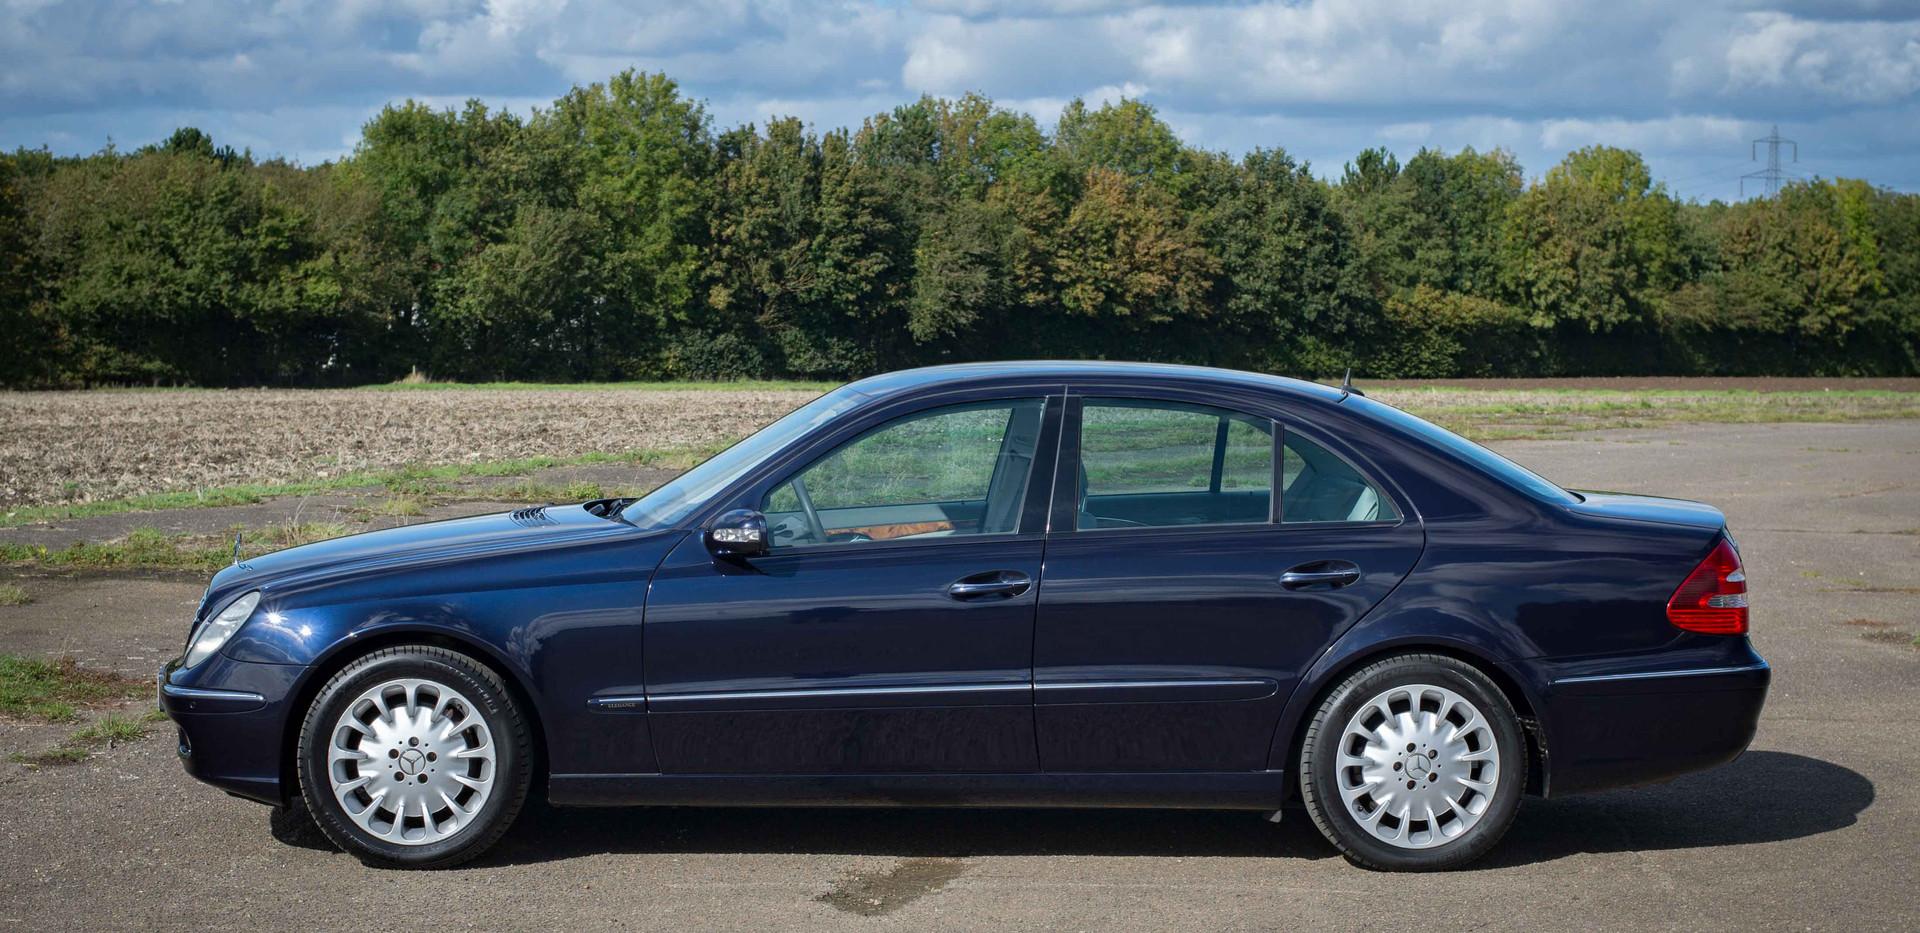 Mercedes E500 For Sale UK London  (8 of